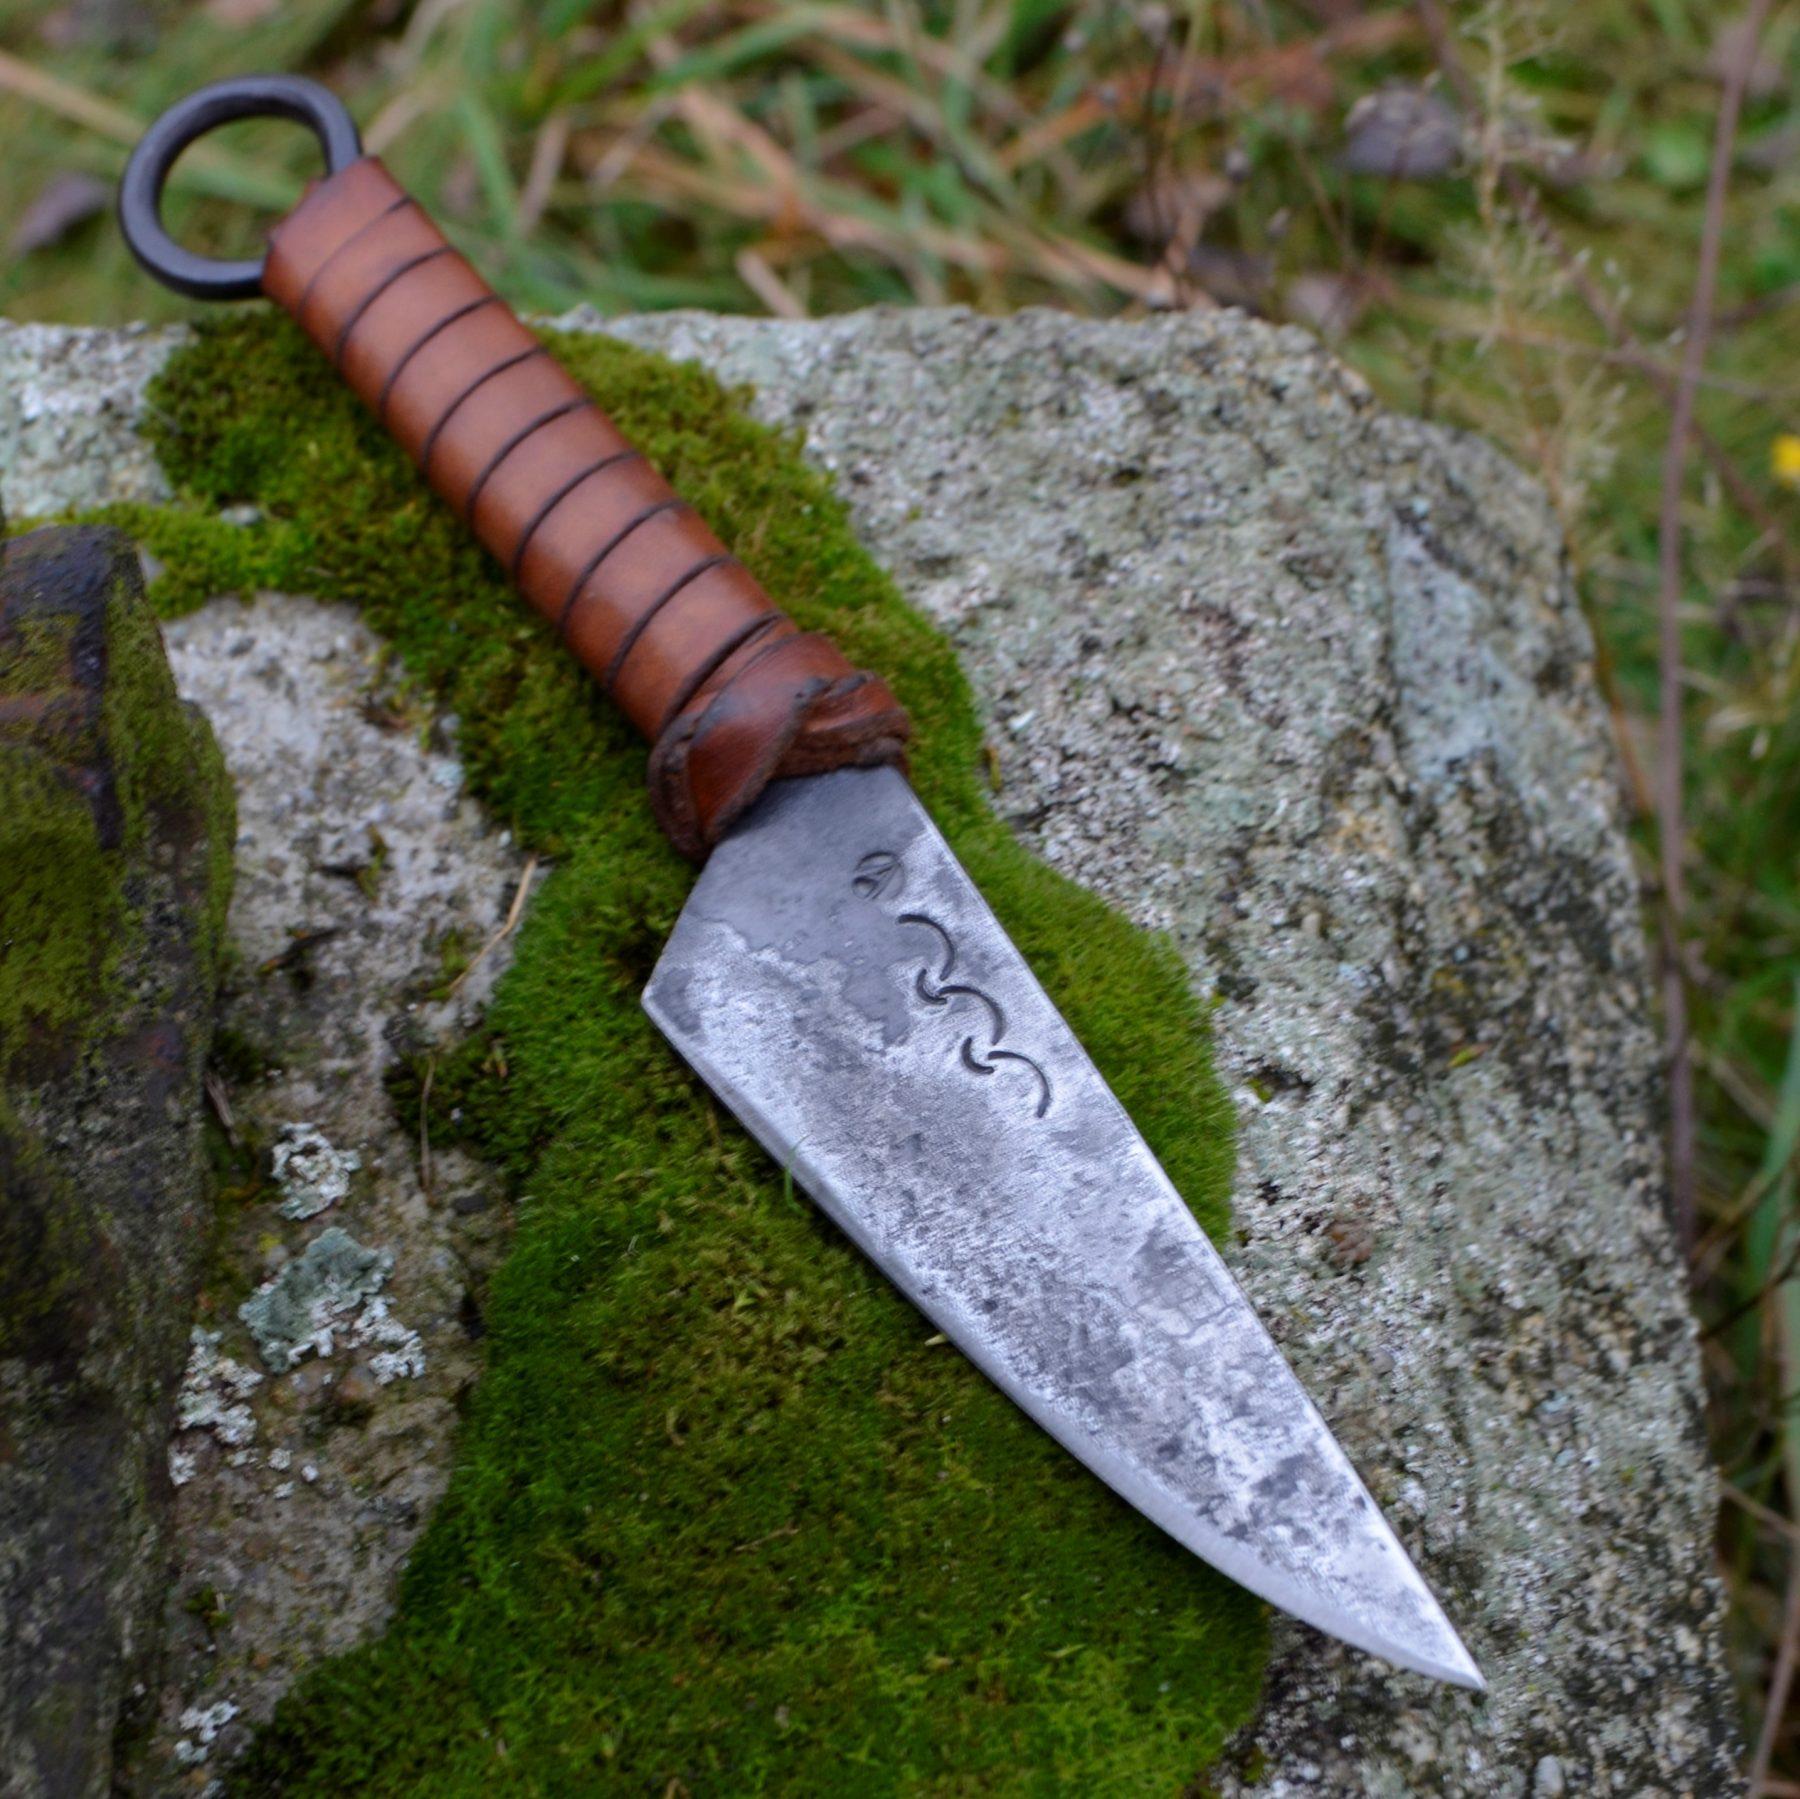 Celtic Knife II